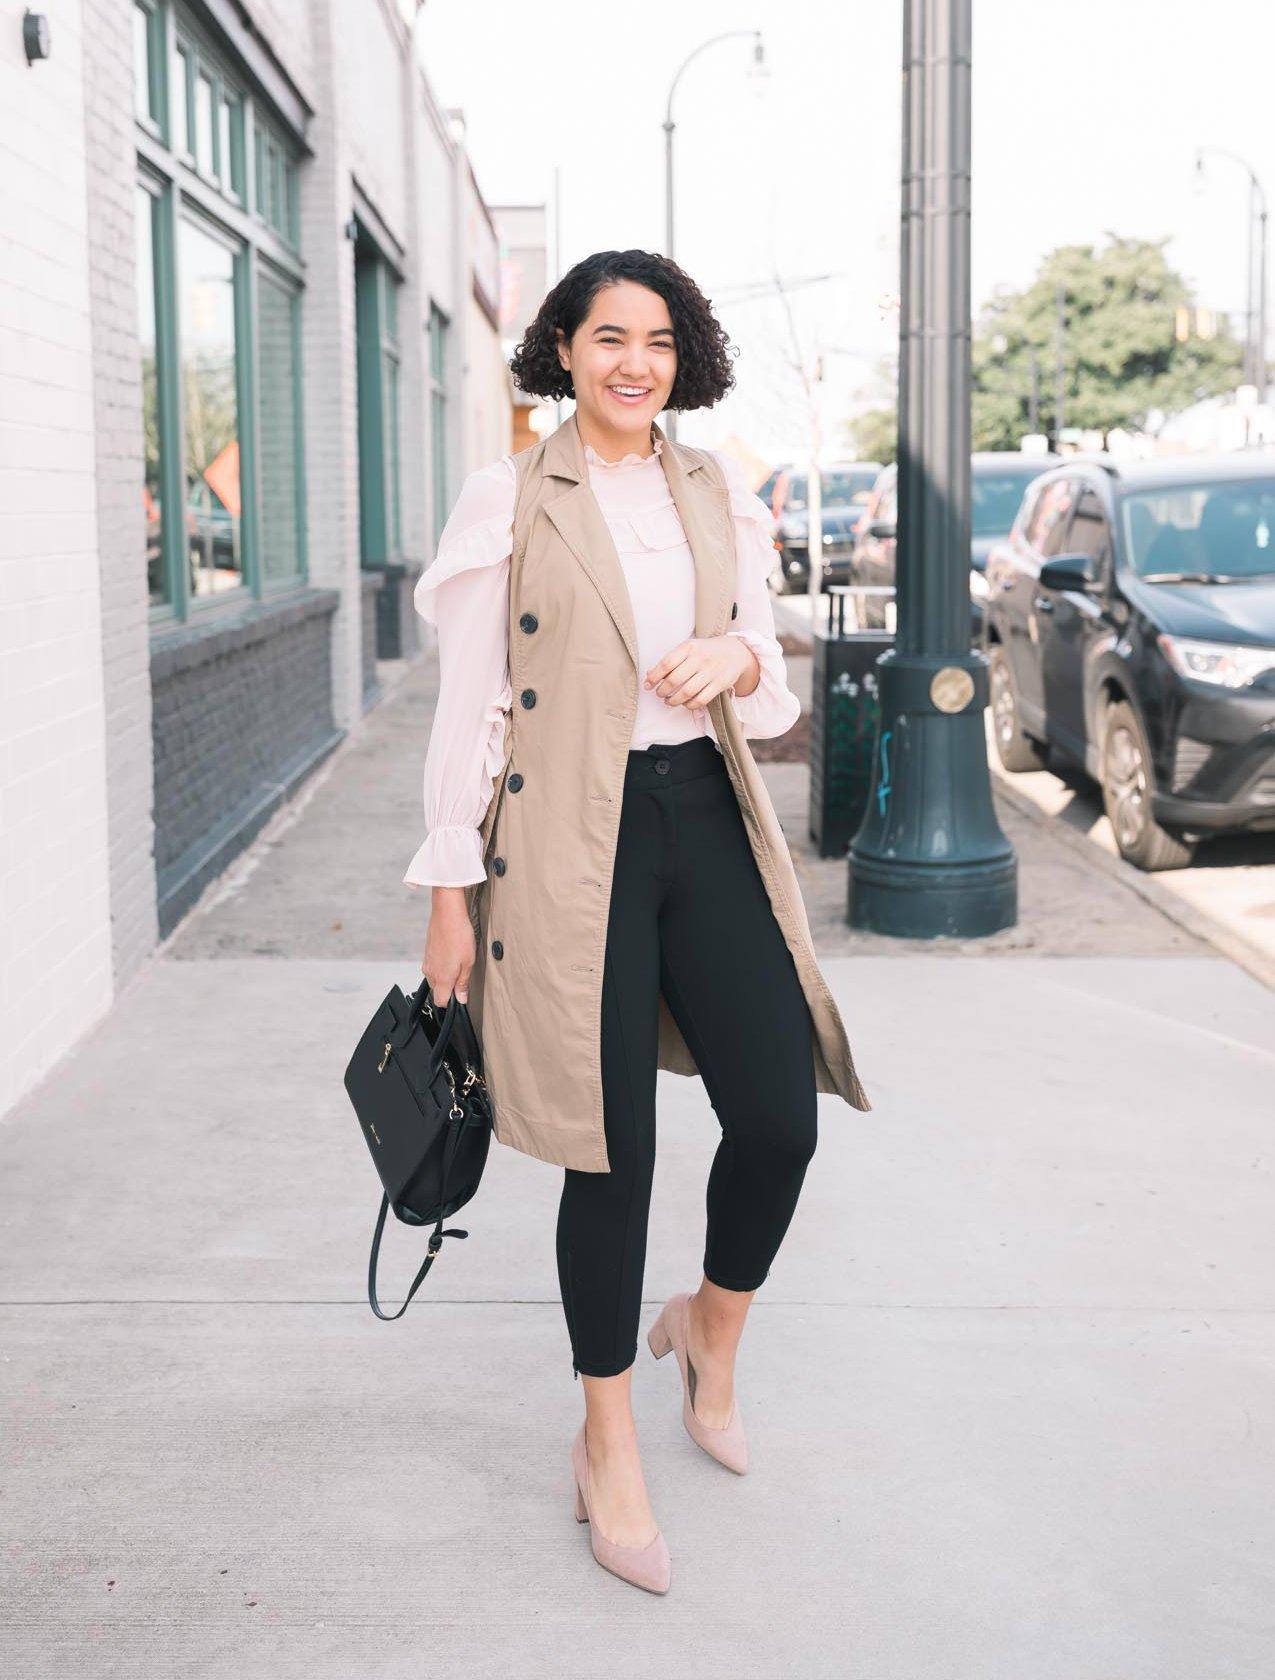 Pink Ruffle Blouse, Trench Vest, Black Dress Pants, Beige Heels